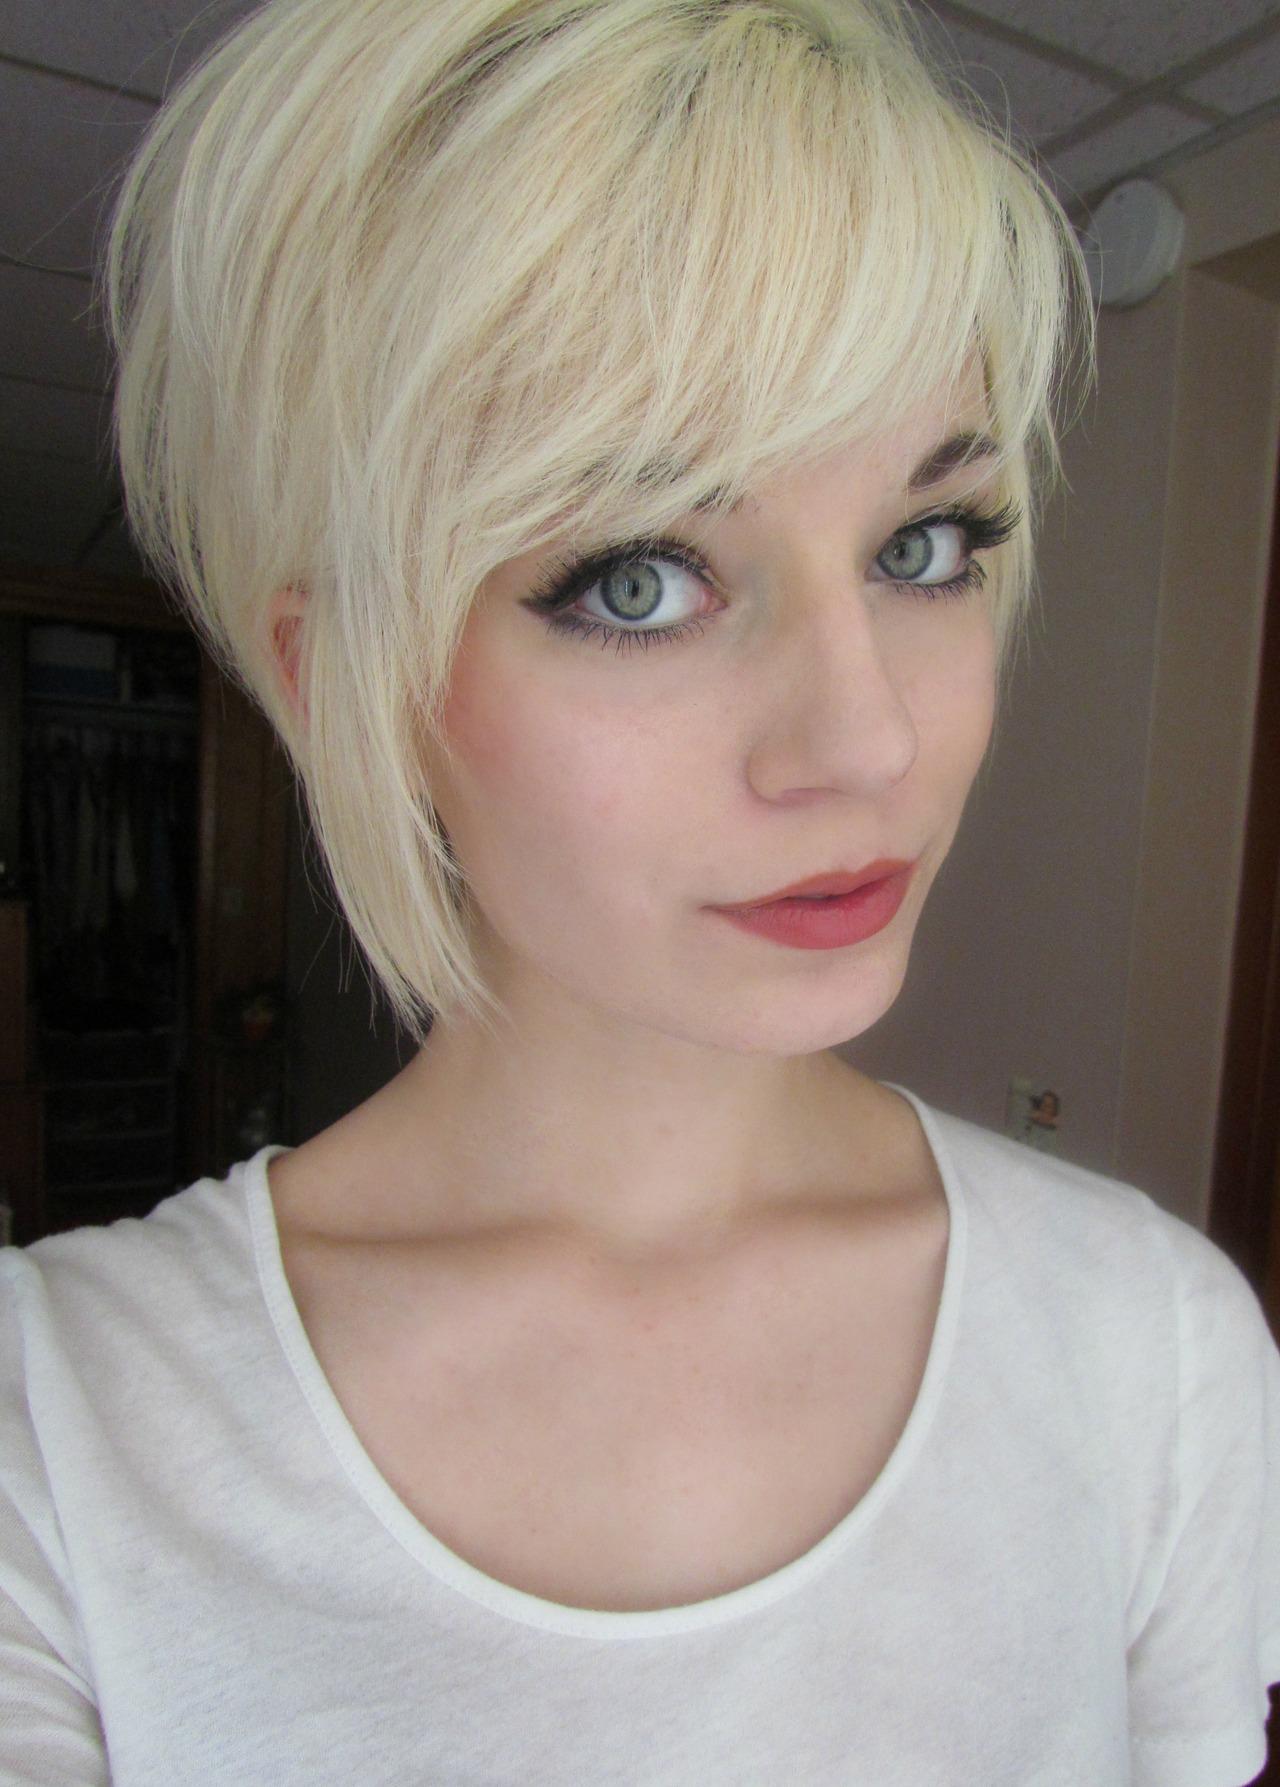 short-pixie-cut-with-side-bangs-asymmetrical-short-hair-hair-inside-asymmetrical-pixie-cuts-asymmetrical-pixie-cuts